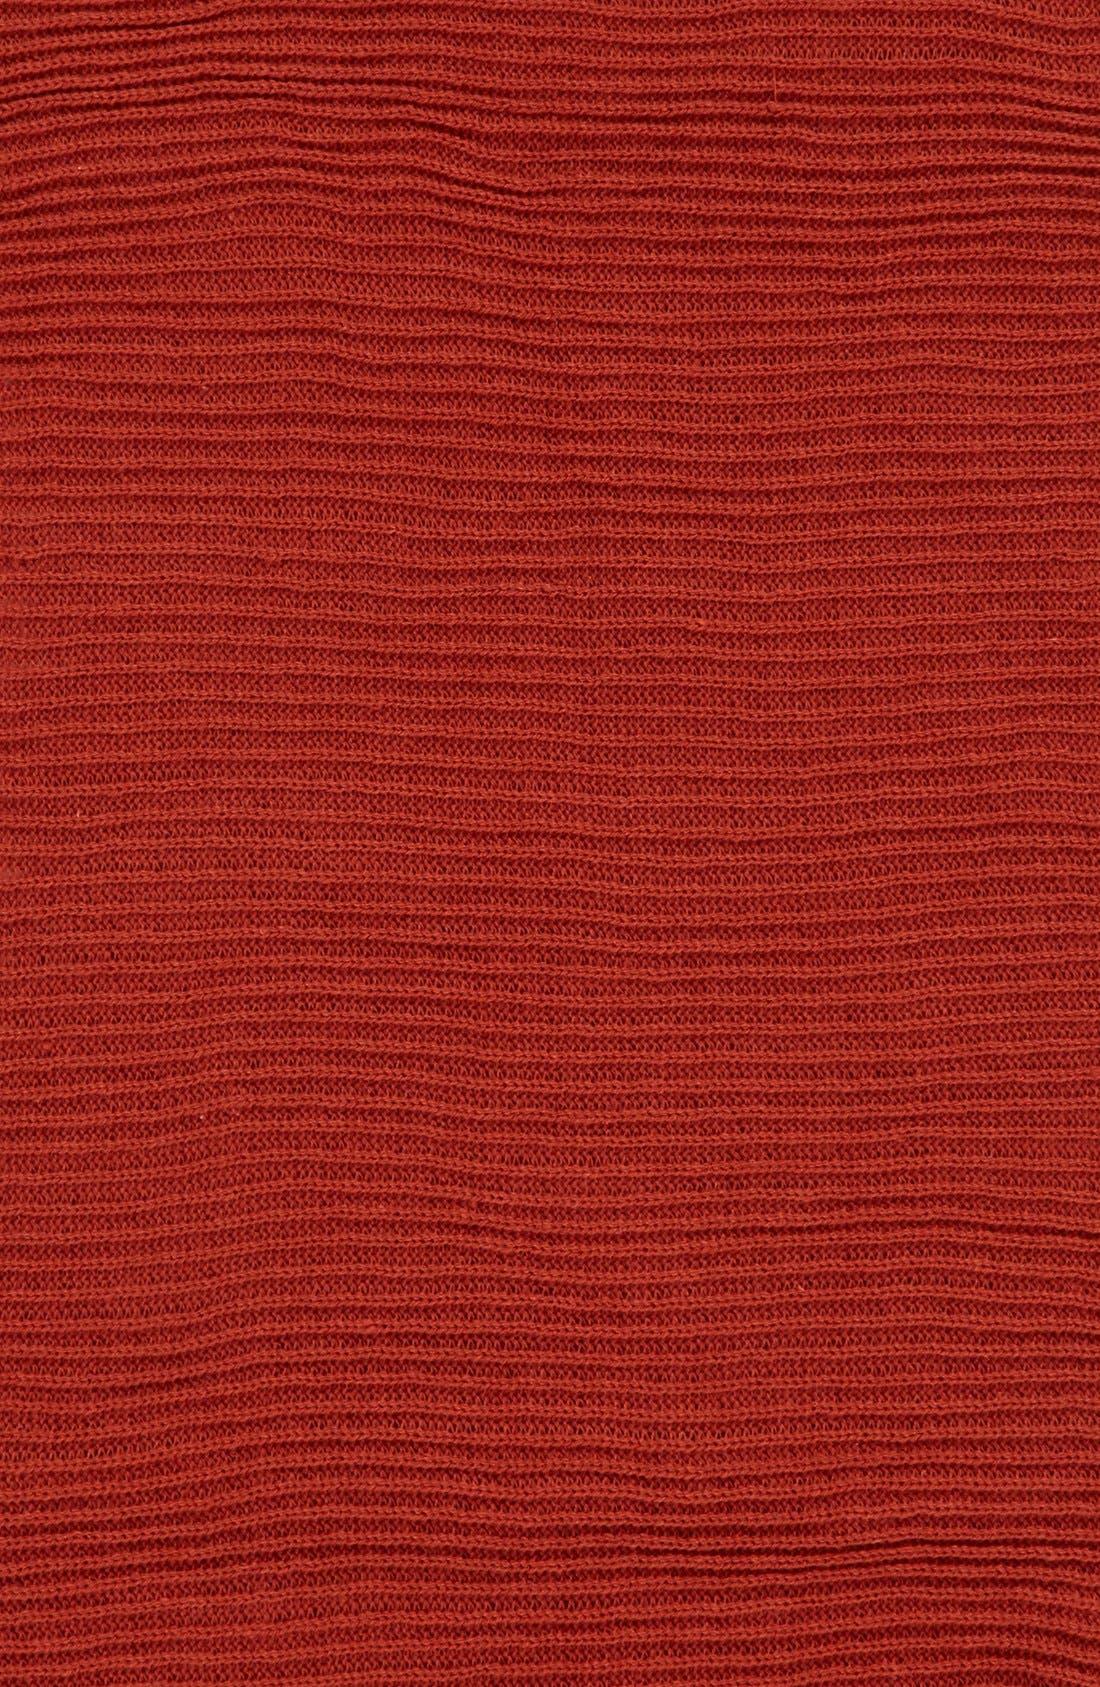 Rib Knit Fringe Infinity Scarf,                             Alternate thumbnail 17, color,